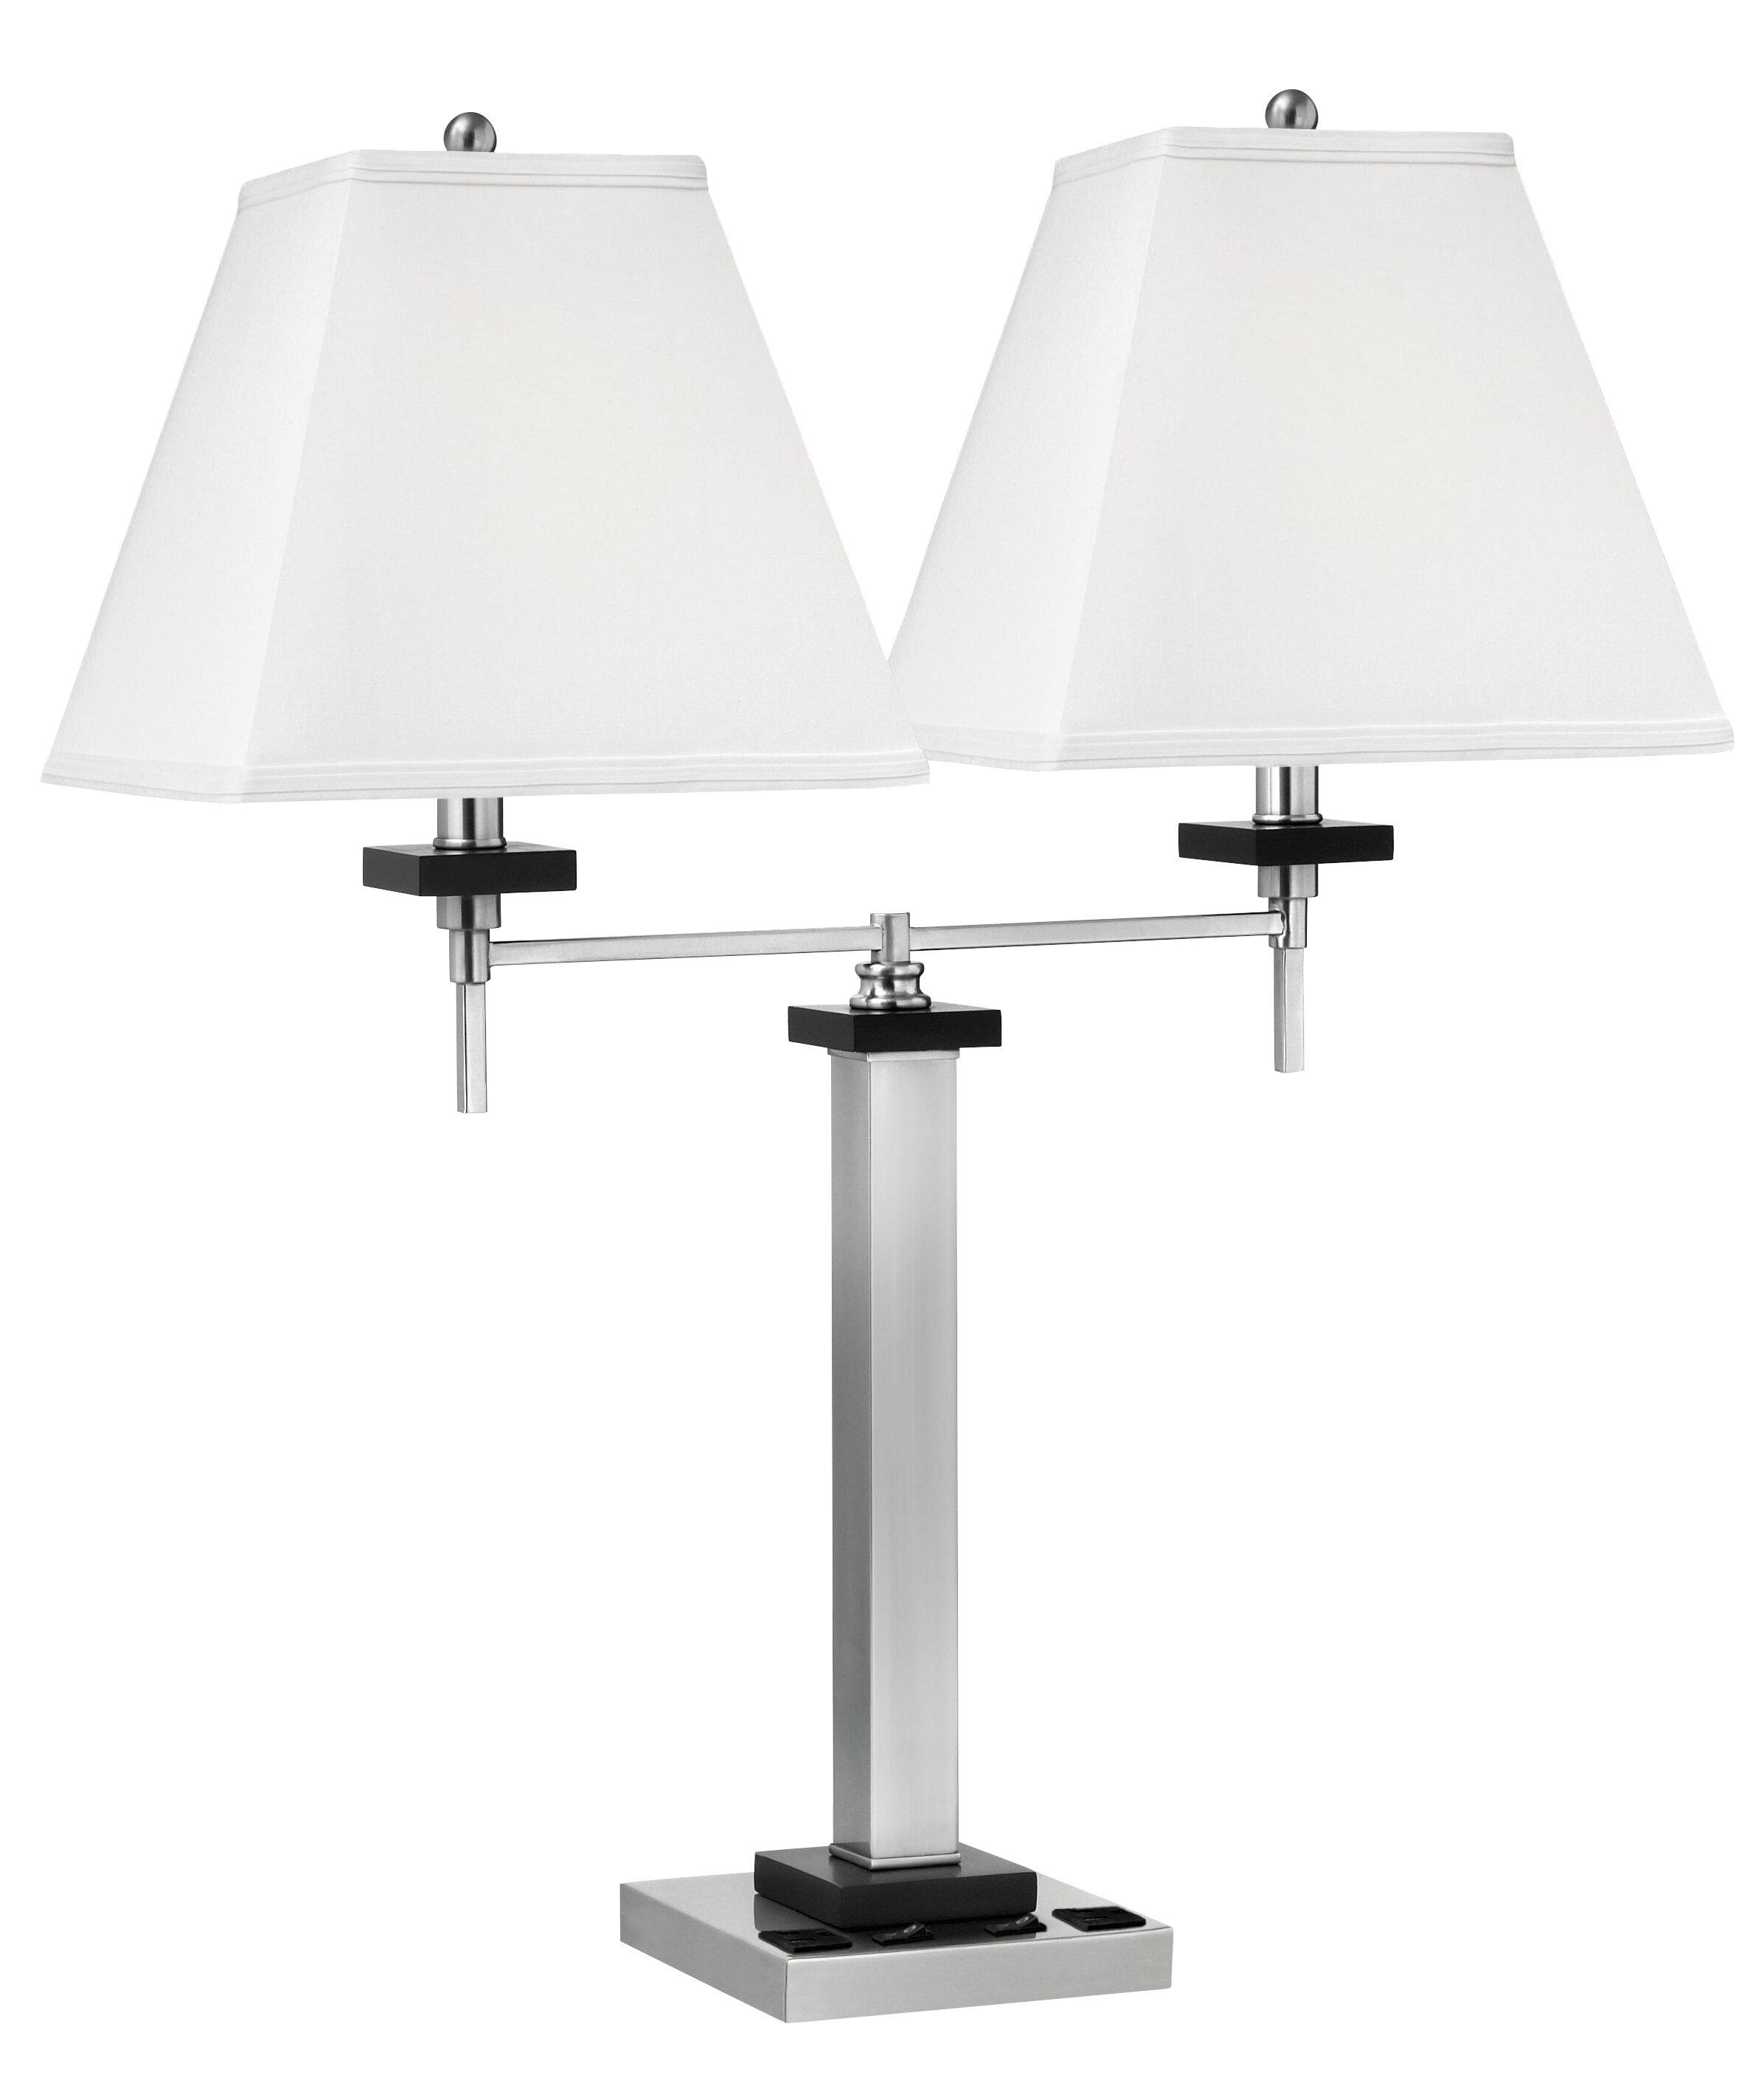 Medallion Lighting Twin Light Double Nightstand Lamp Wayfair